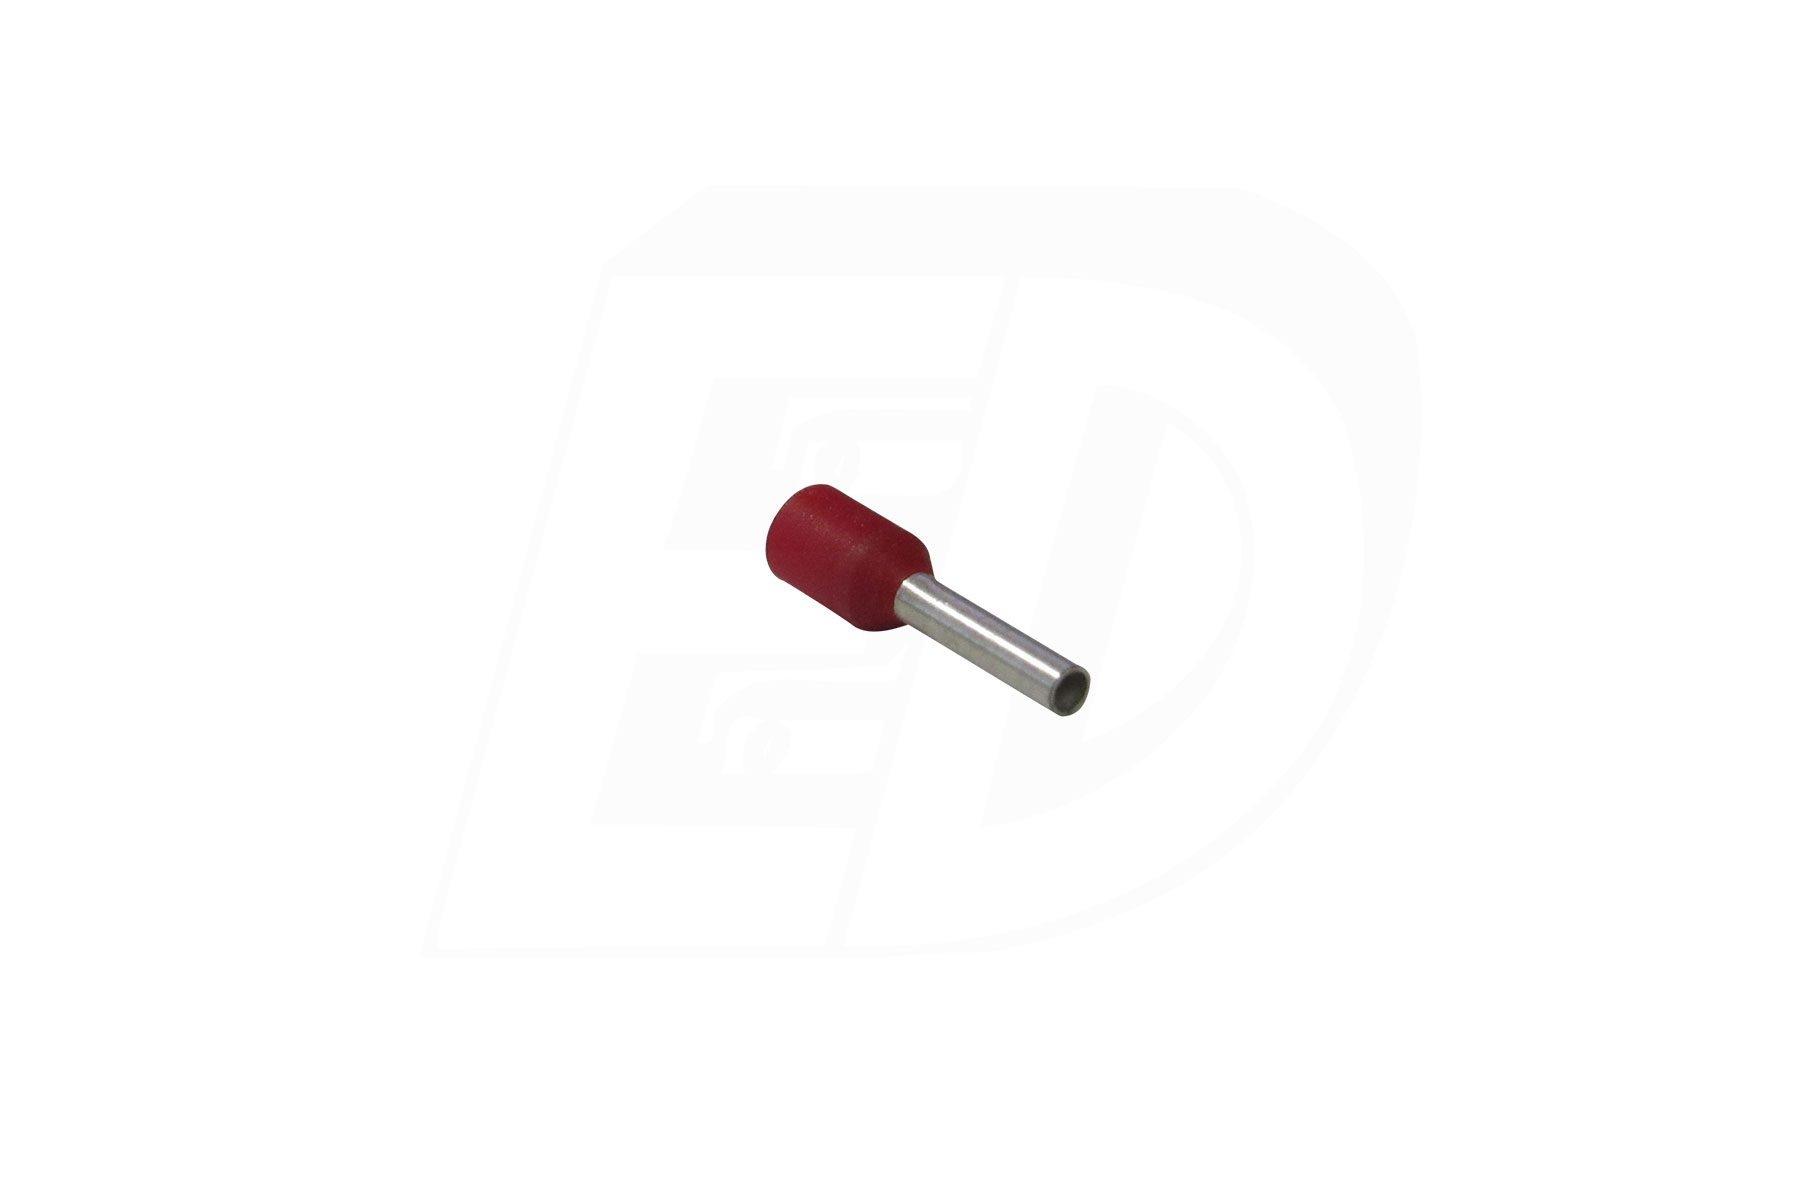 Brazed Seam Nylon Insulated Ferrule Connectors 18 AWG